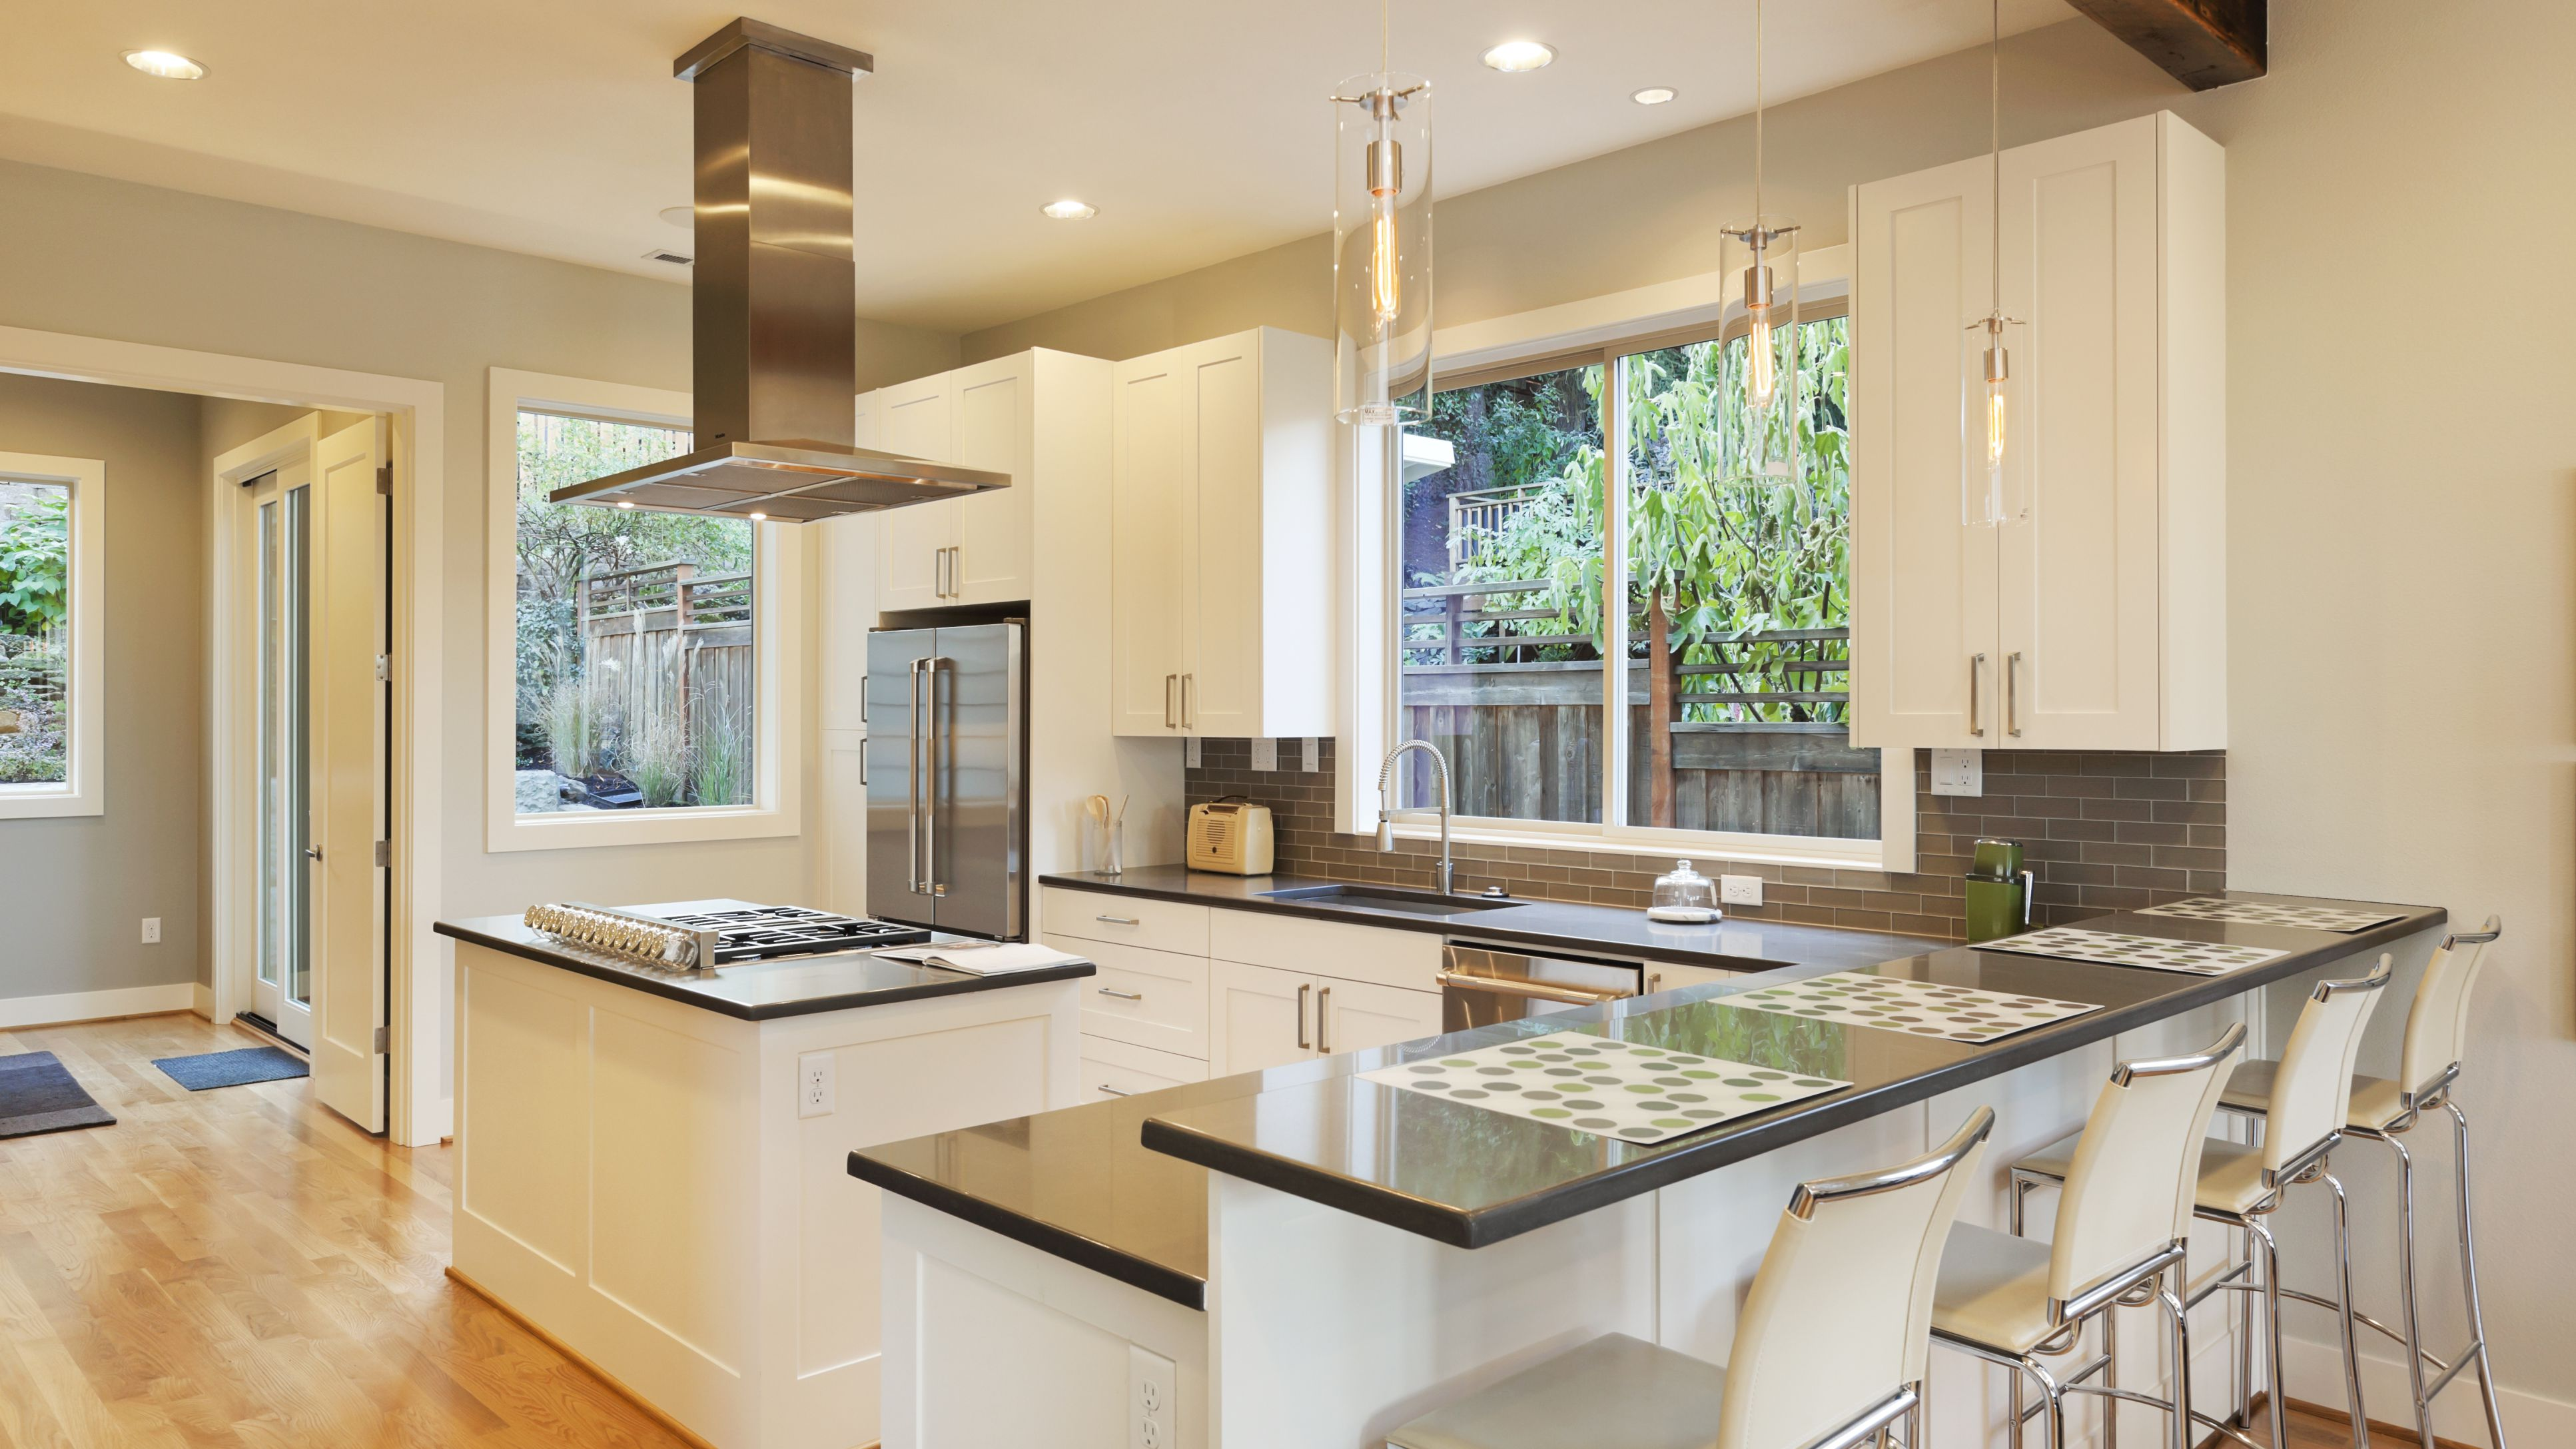 Kitchen Space Design Recommendations And Distances